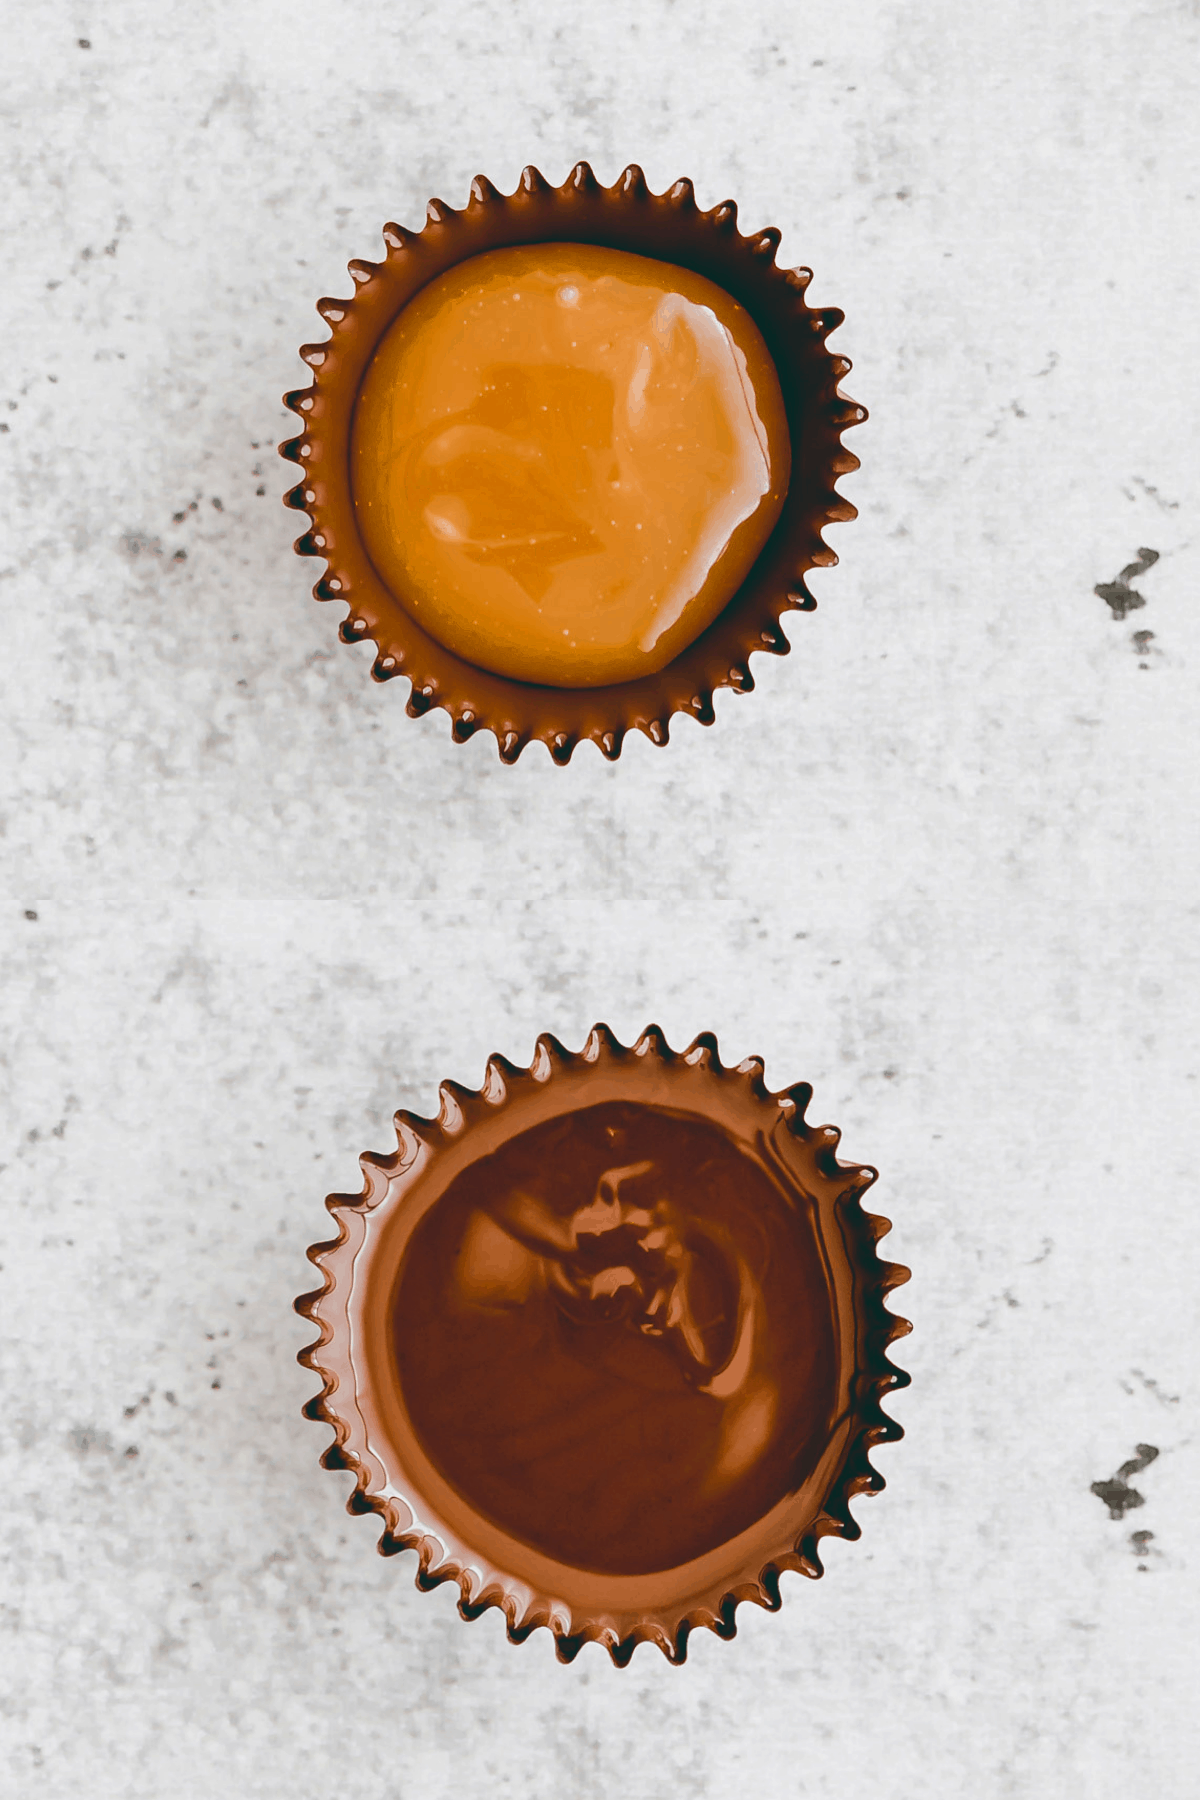 Salted Caramel Chocolate Cups Recipe Step-4-5